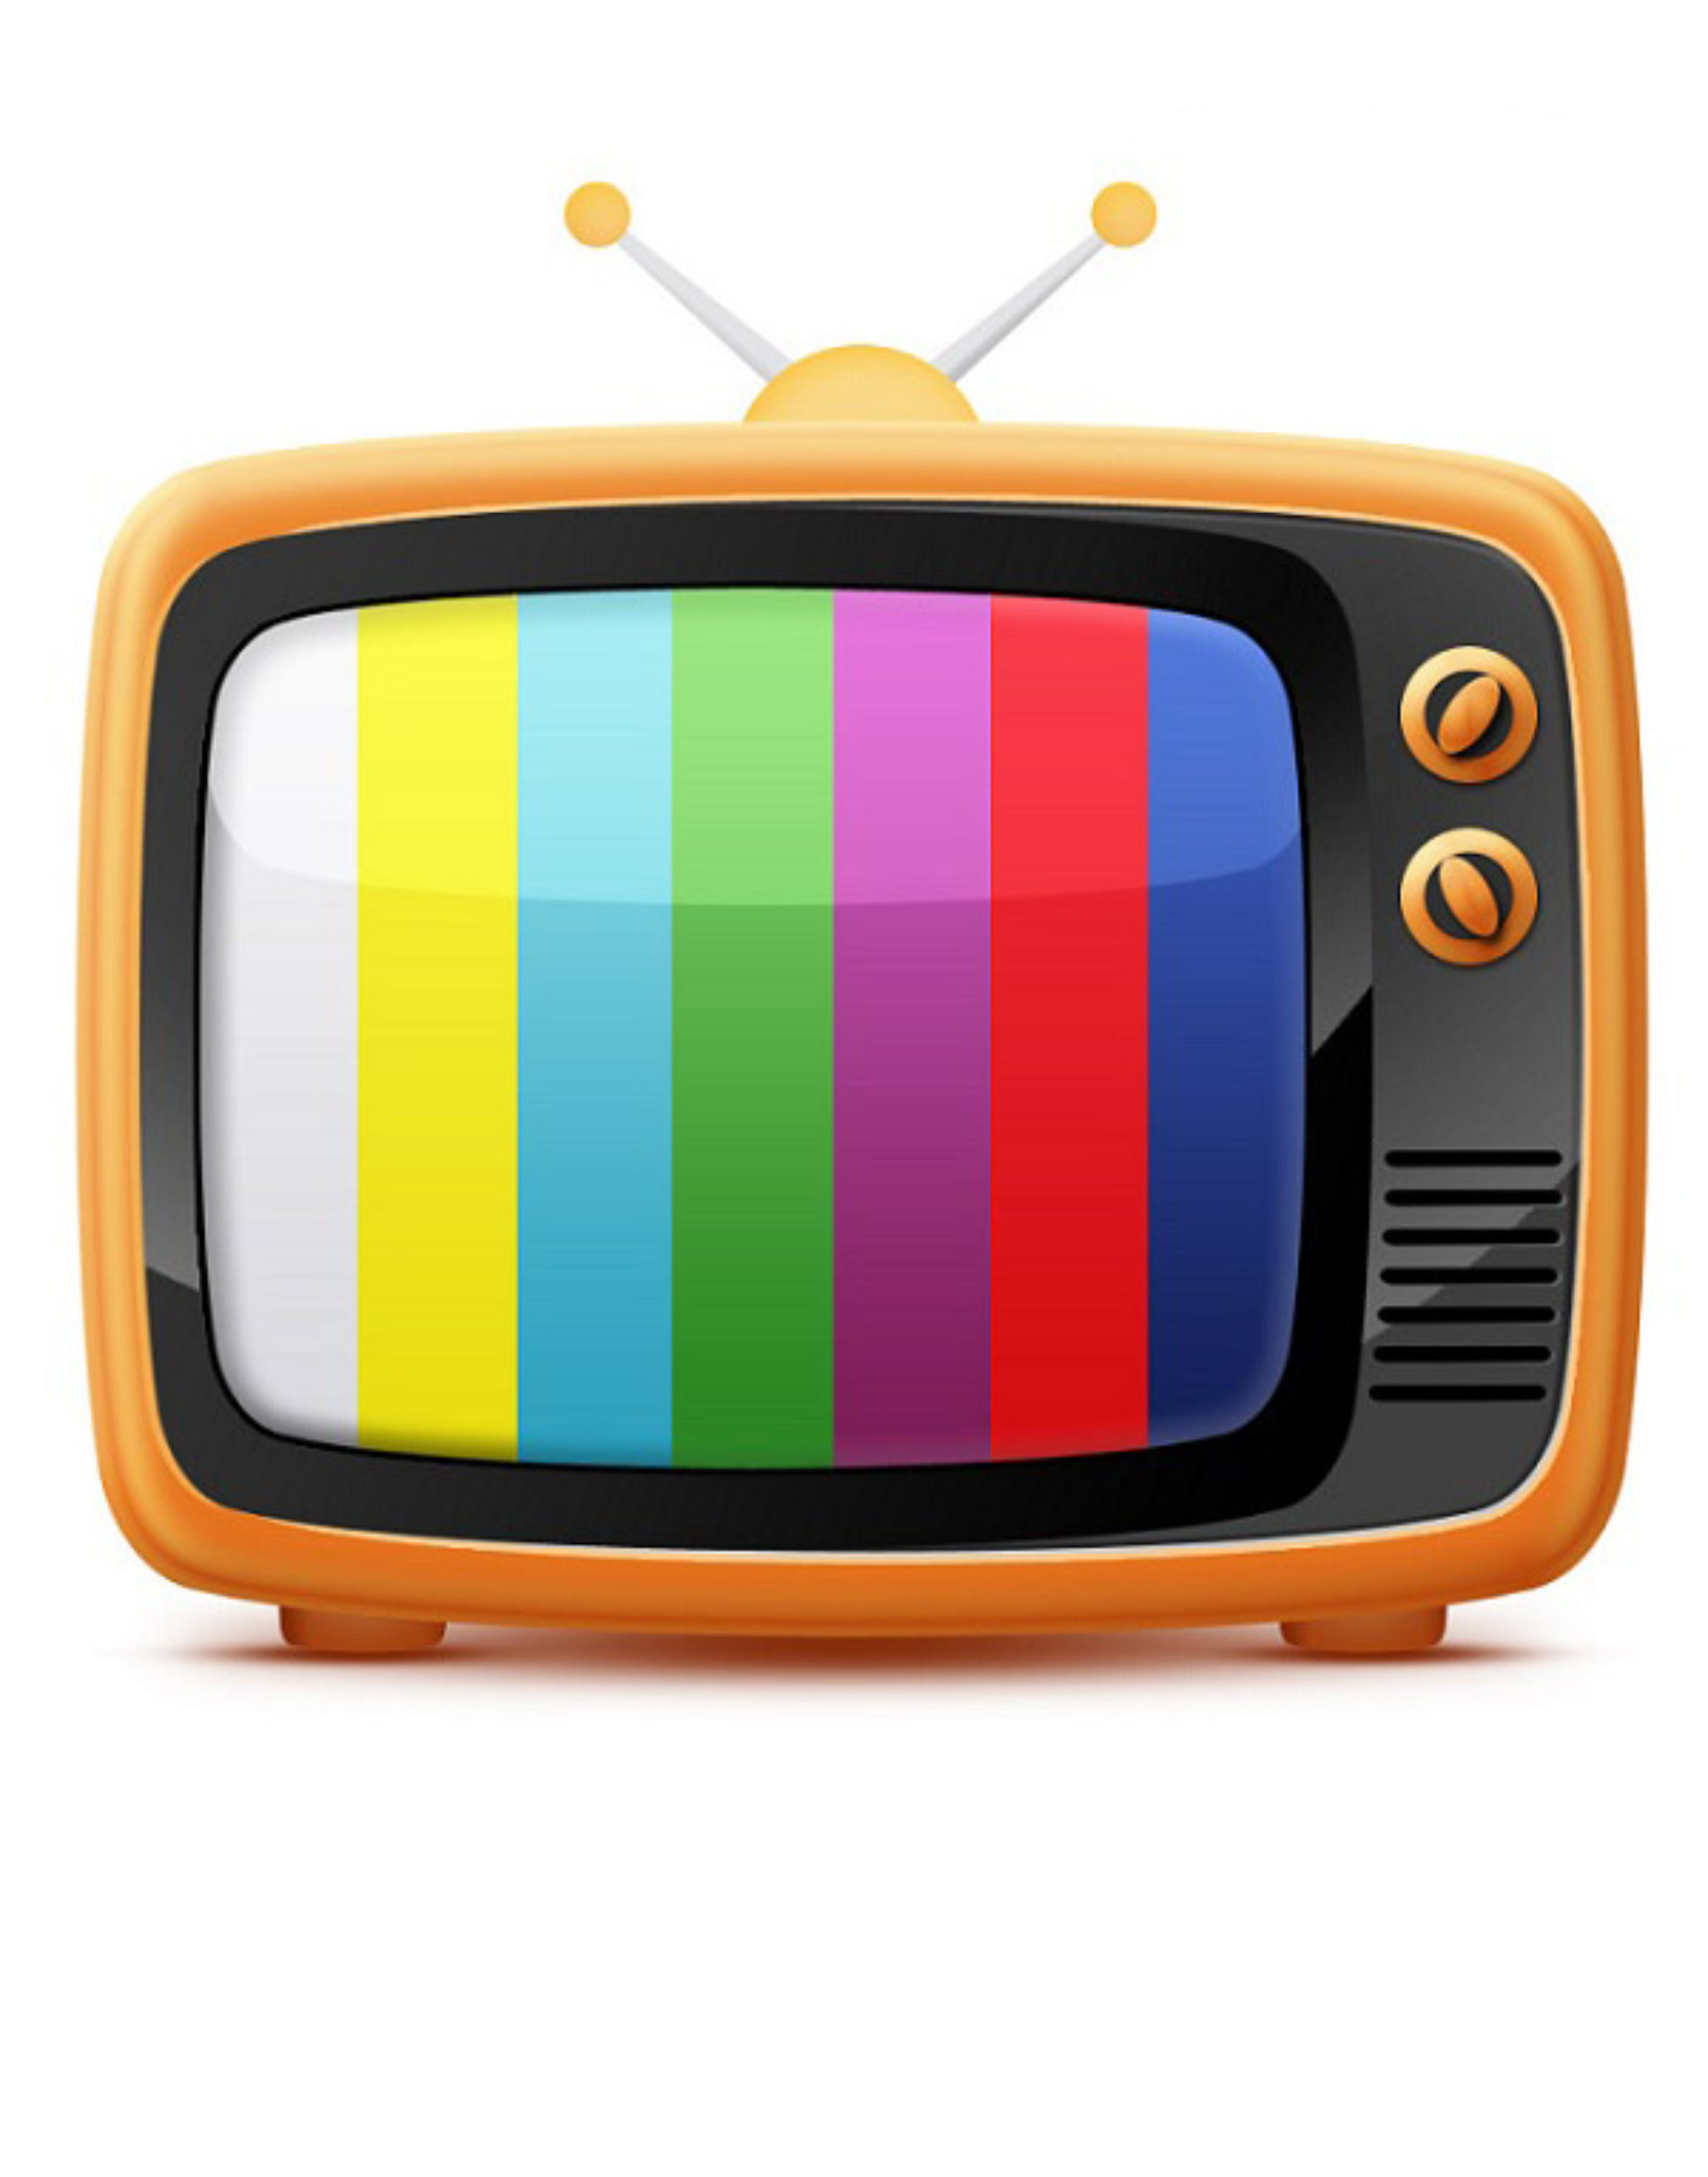 22:00 > Directo TV: Super V8 // 01. Melbourne